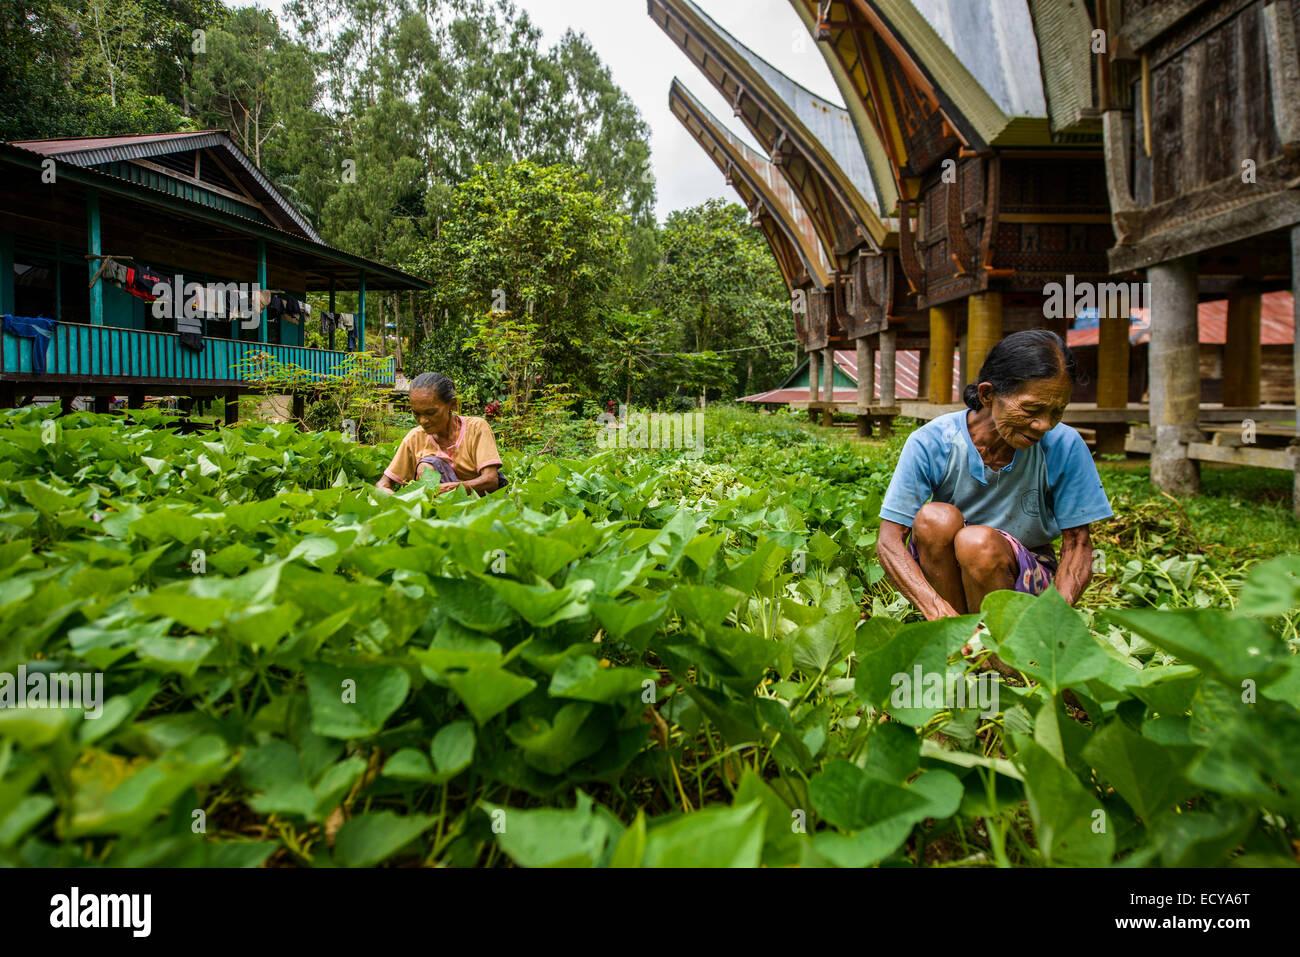 Toraja women working in the fields, Sulawesi, Indonesia - Stock Image